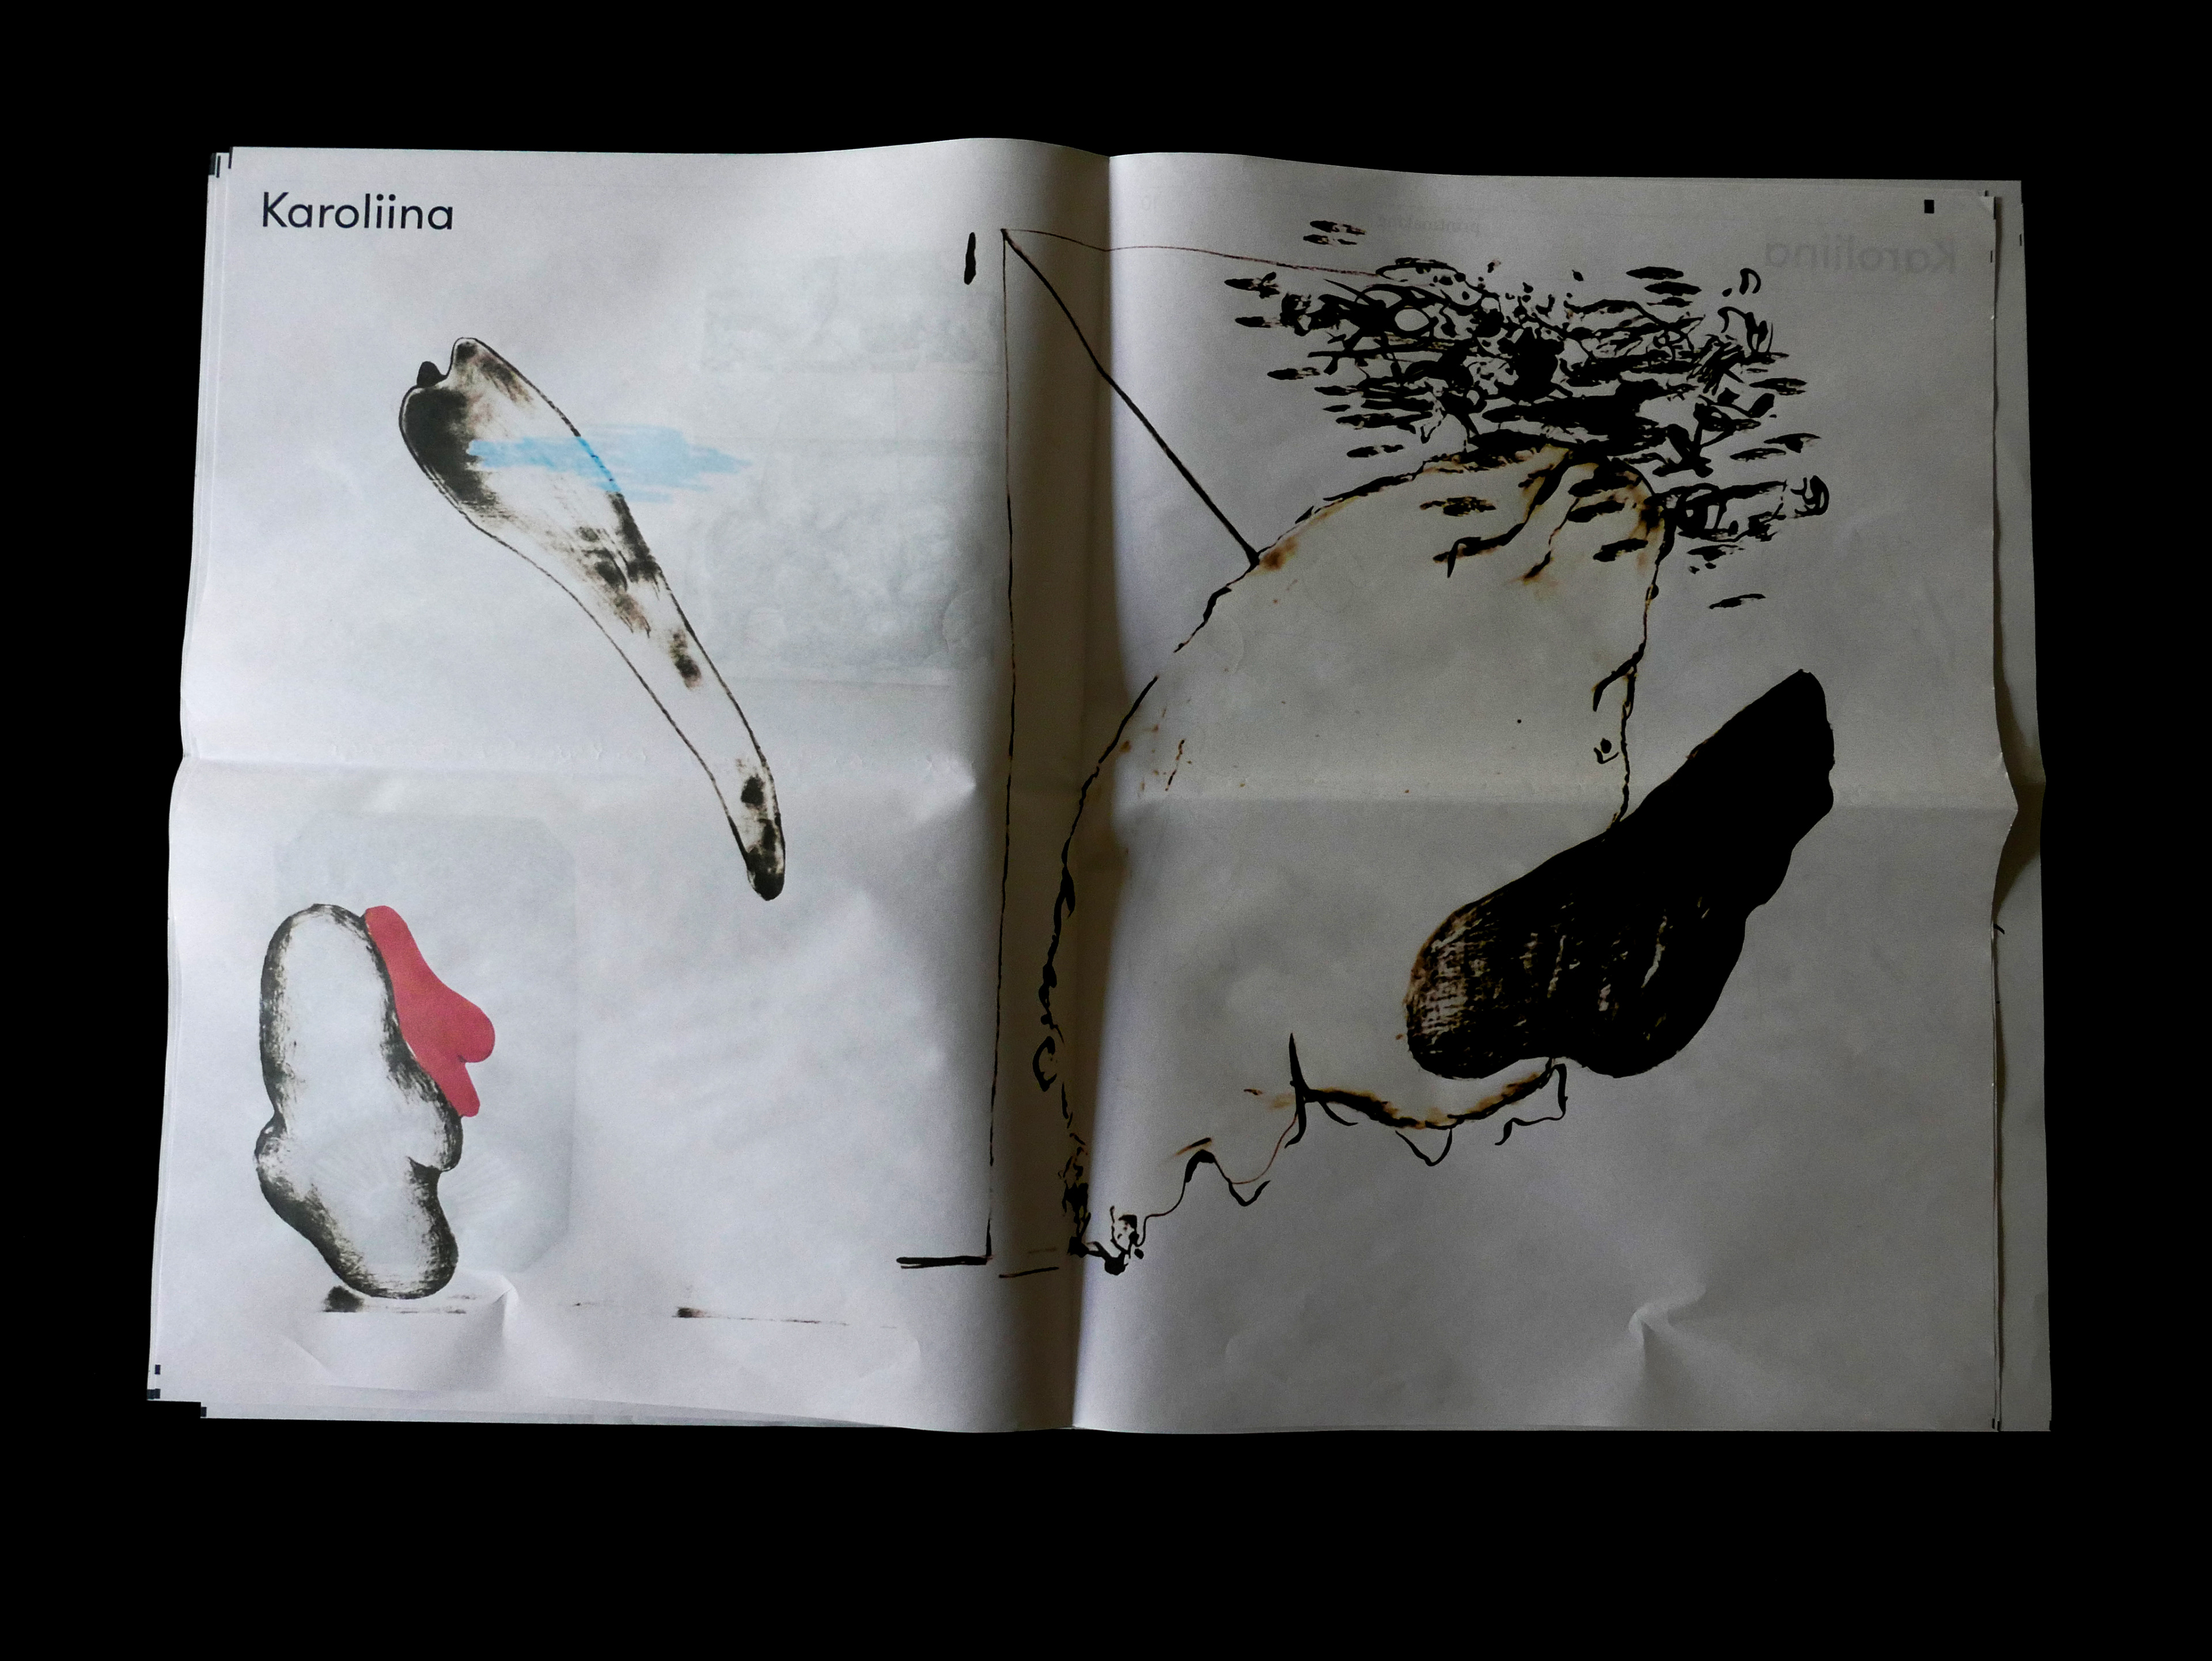 Aleksandra Braska How To Draw Newspaper Publication